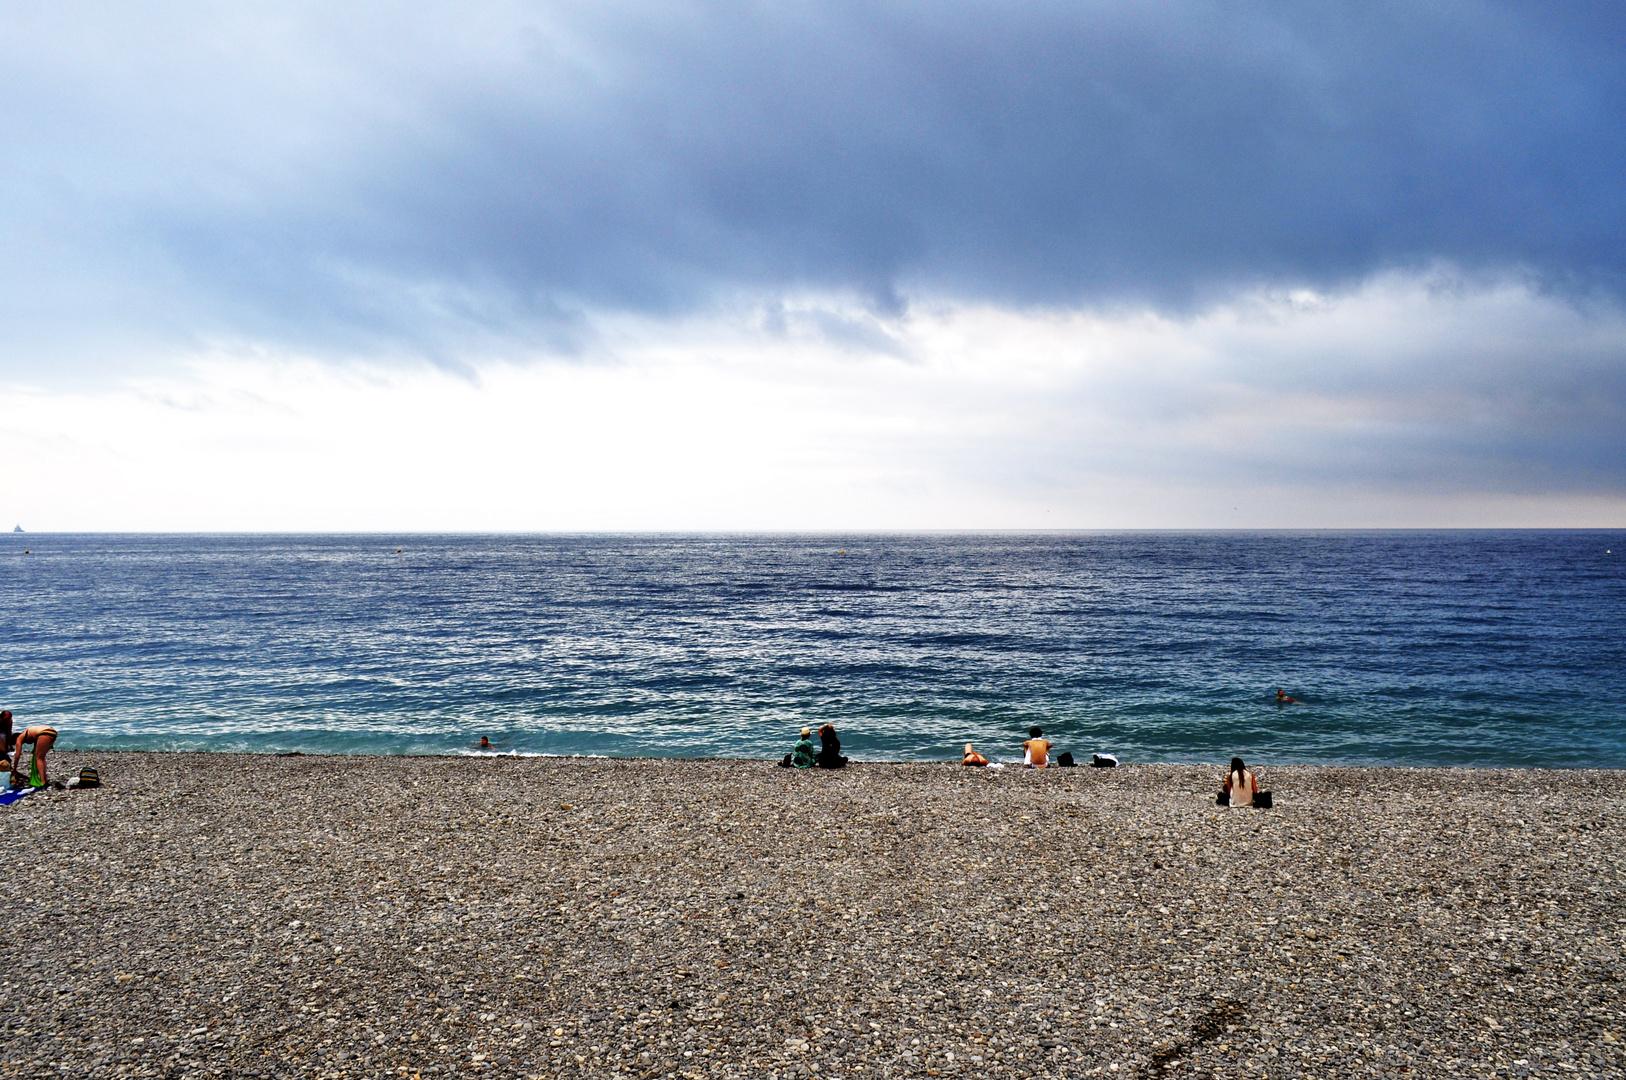 sunless sea - deep blue